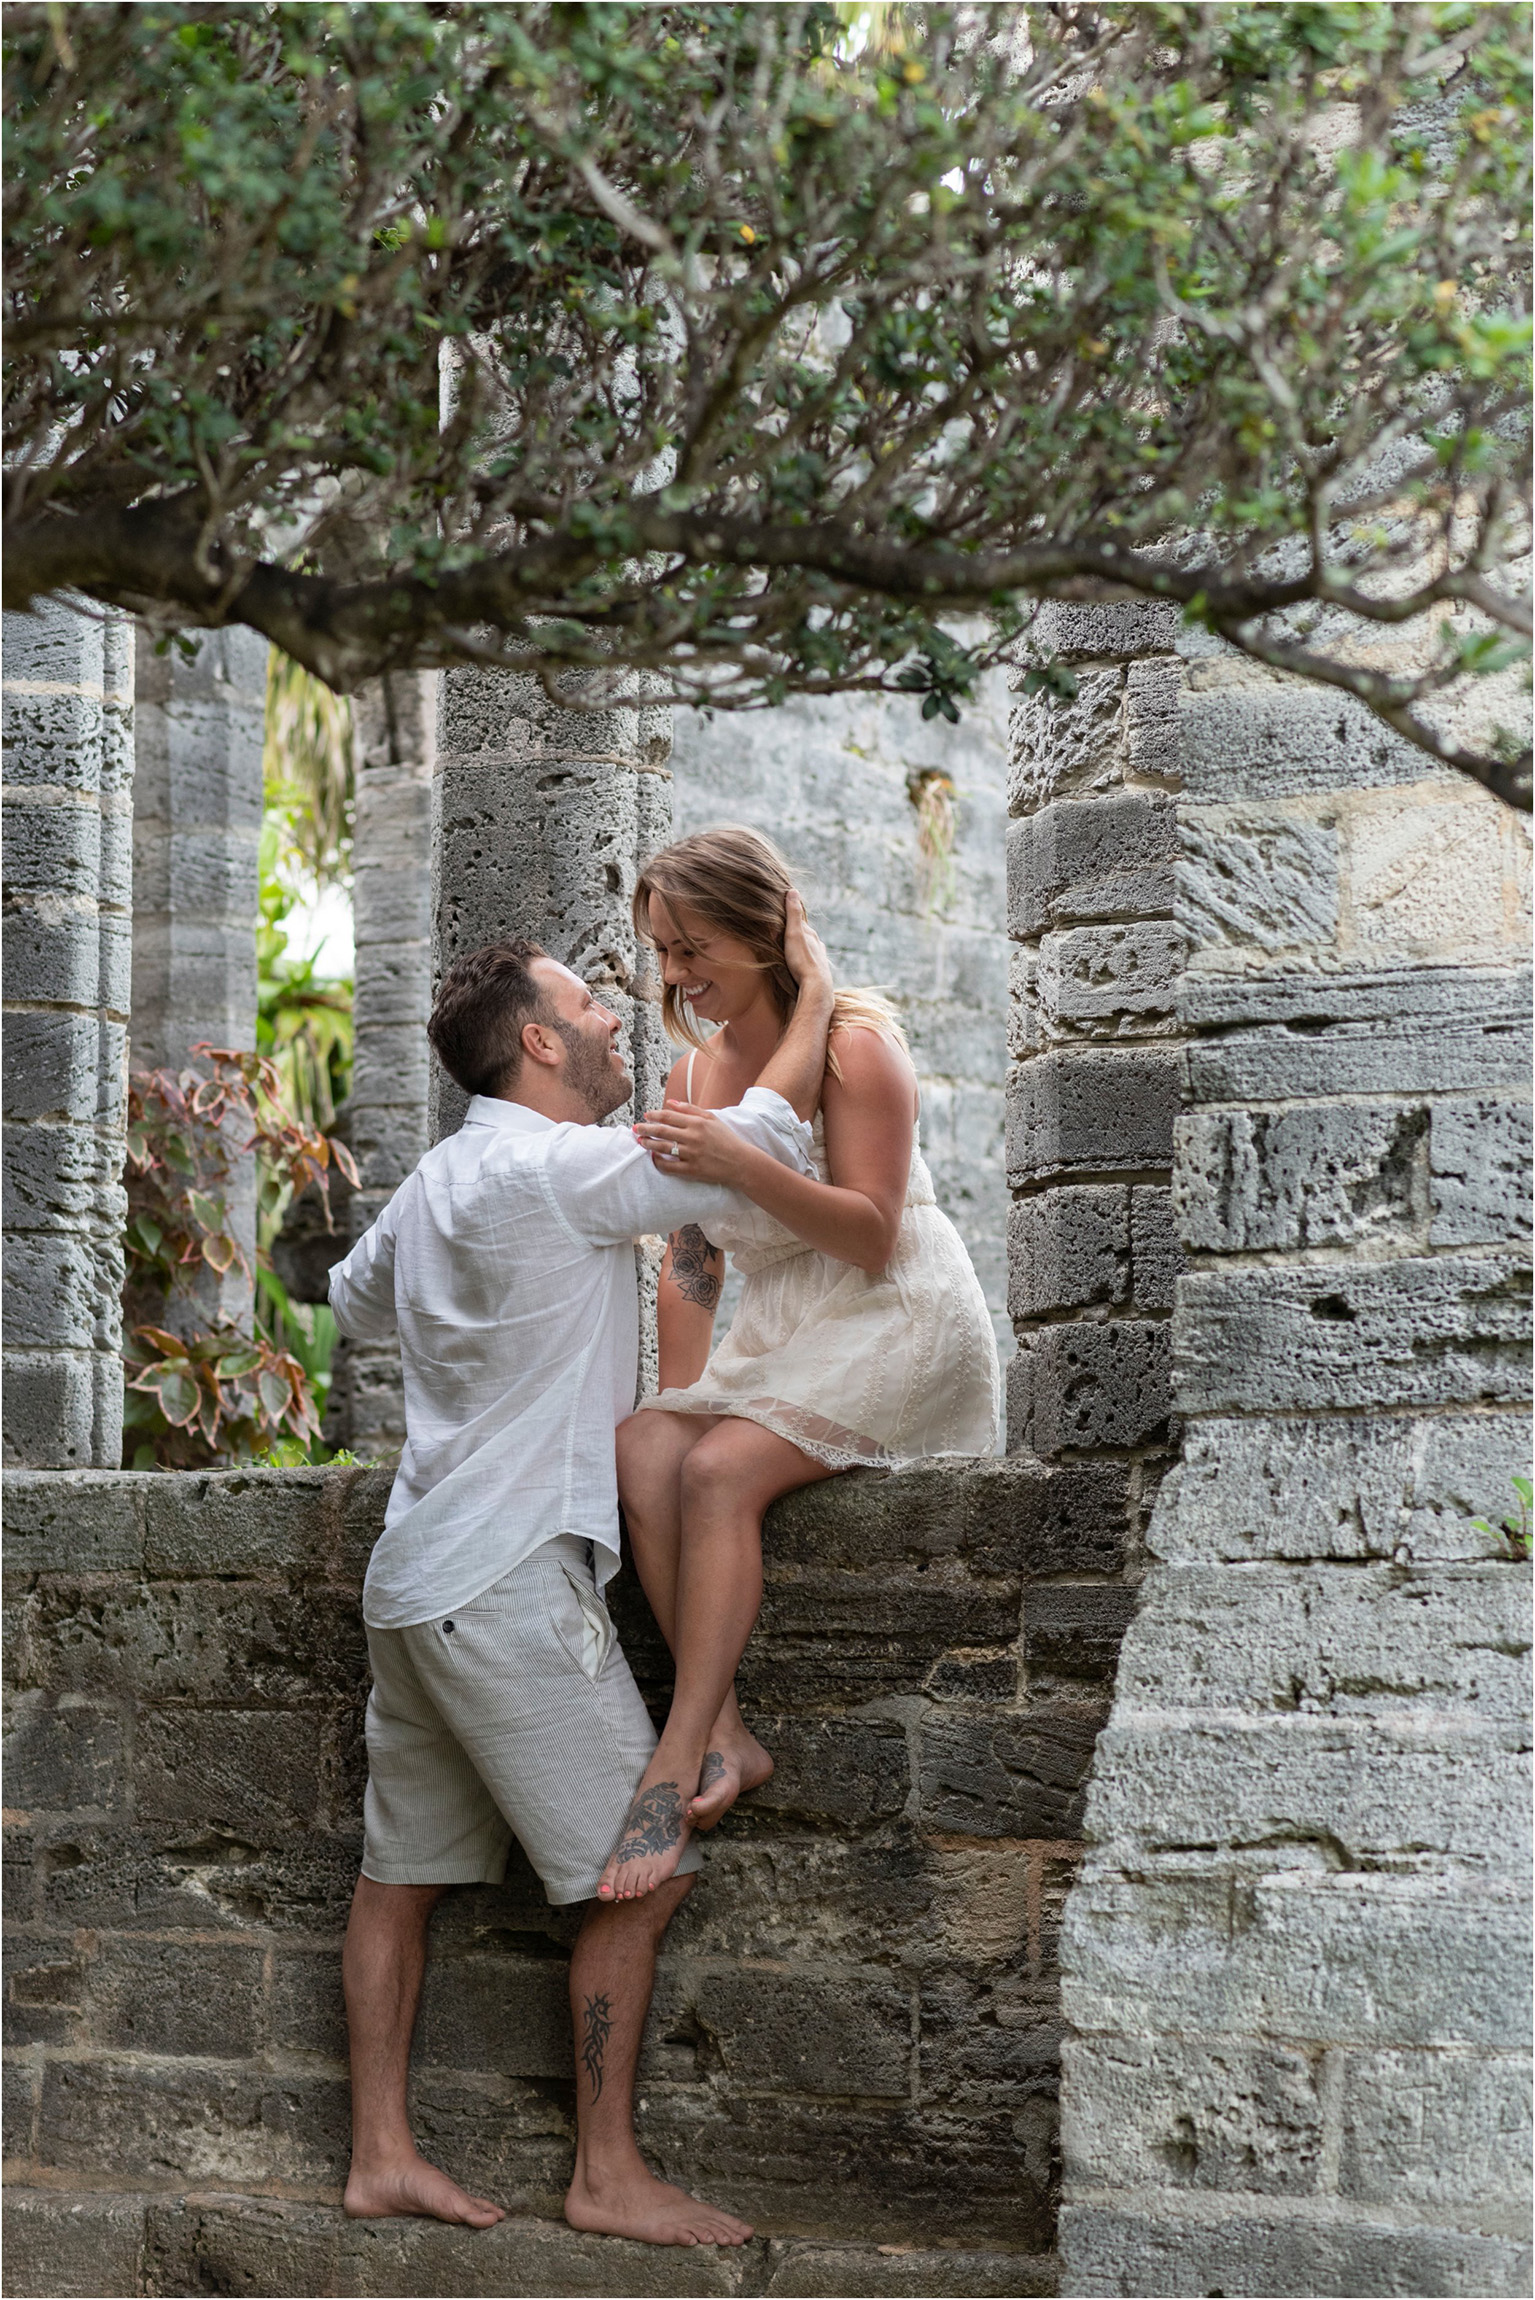 ©FianderFoto_Bermuda Engagement Photographer_St Georges_Danielle_David_013.jpg